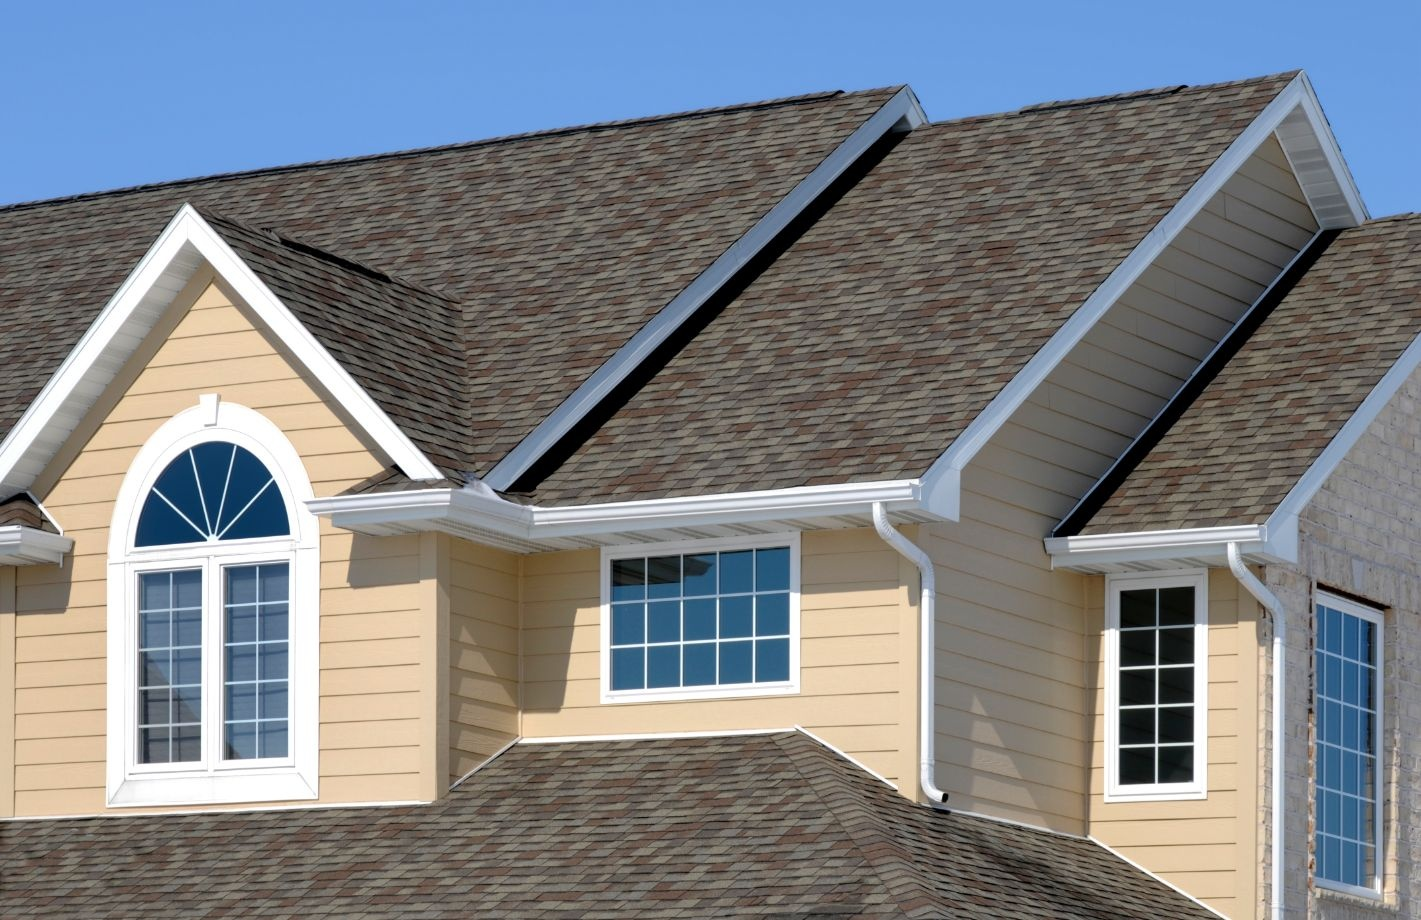 Architectural asphalt shingle roof